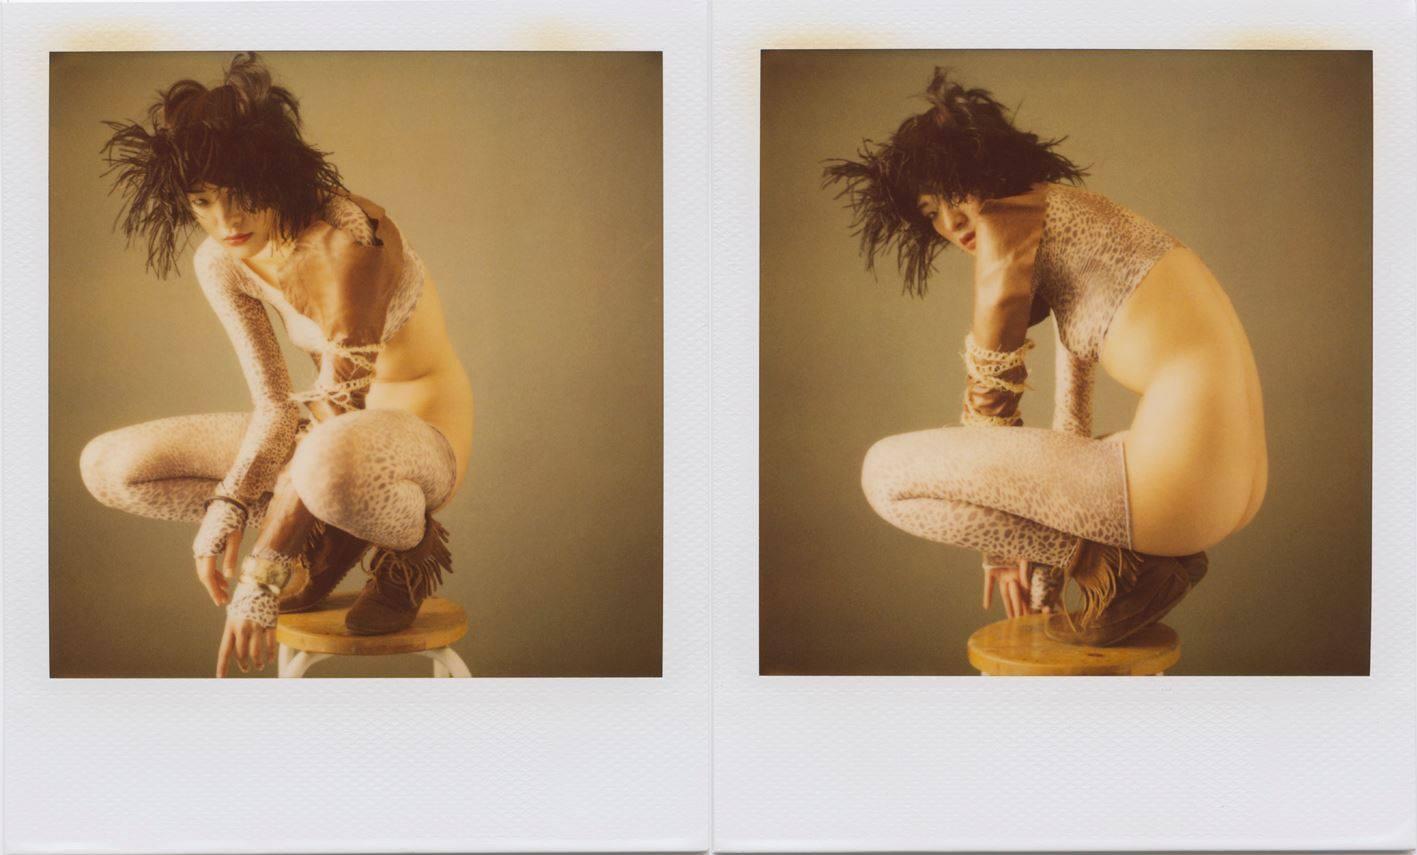 Fabrice Mabillot – polaroid / Photographie